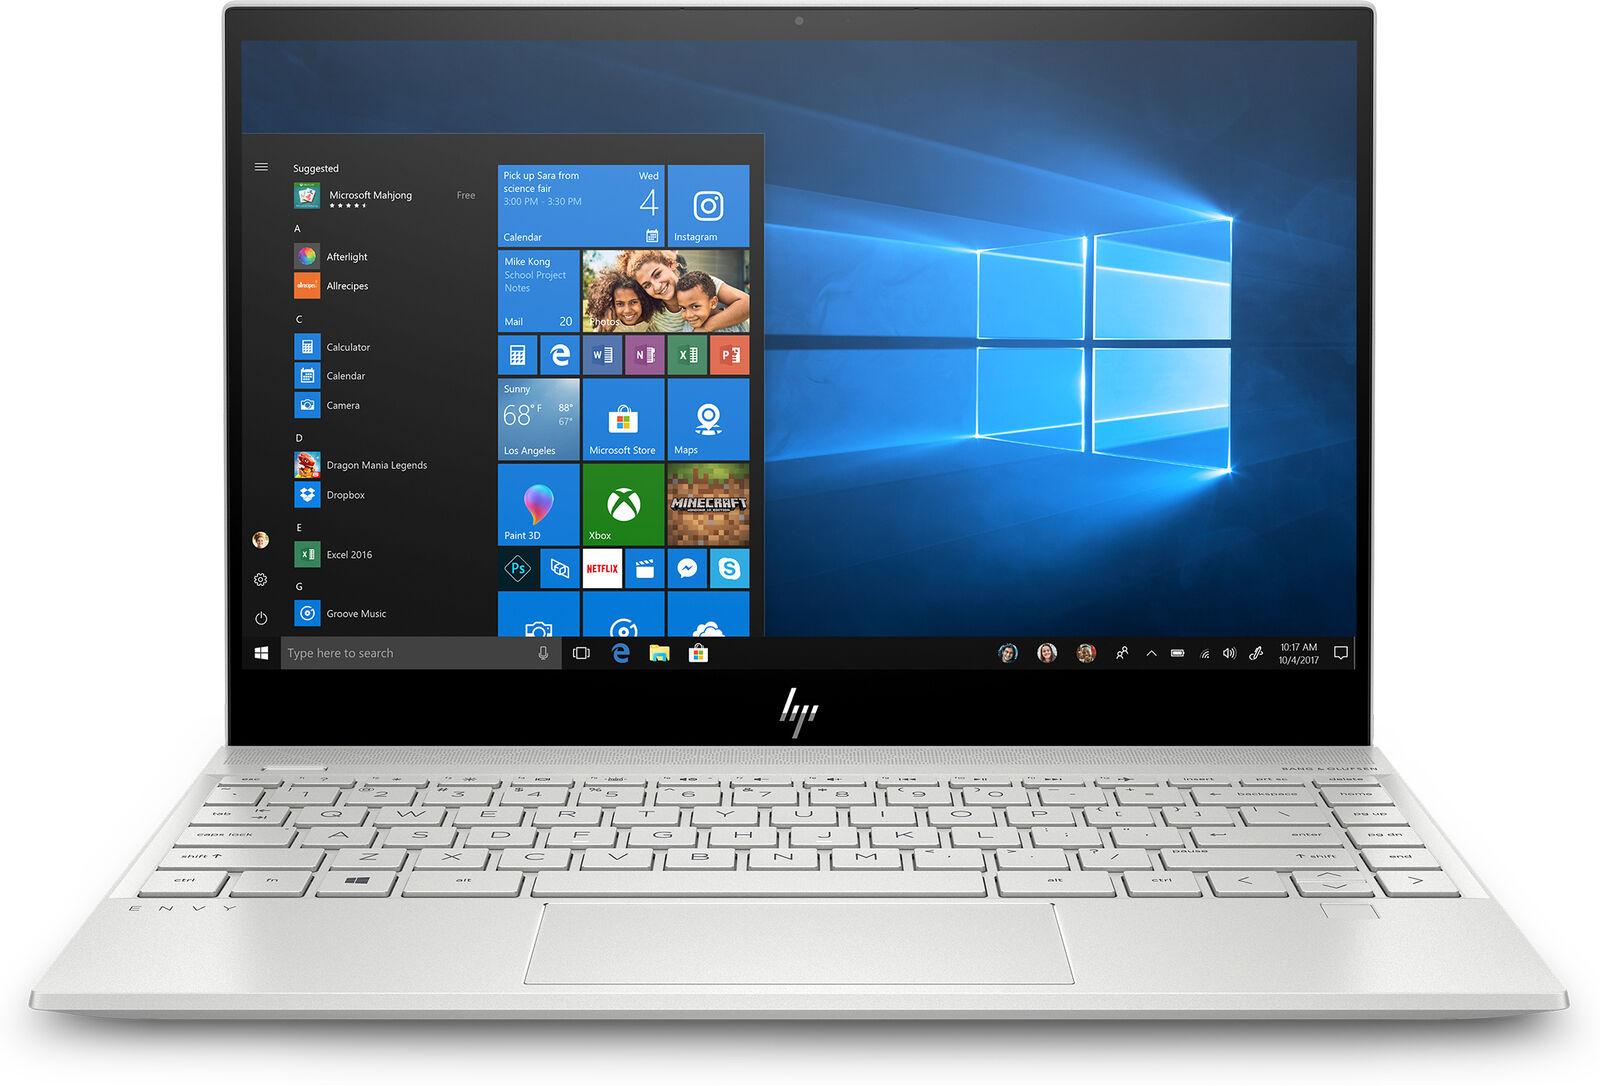 "HP ENVY 13.3"" Full HD Intel Core i5 8GG, 256GB SSD @ eBay - $499.99"